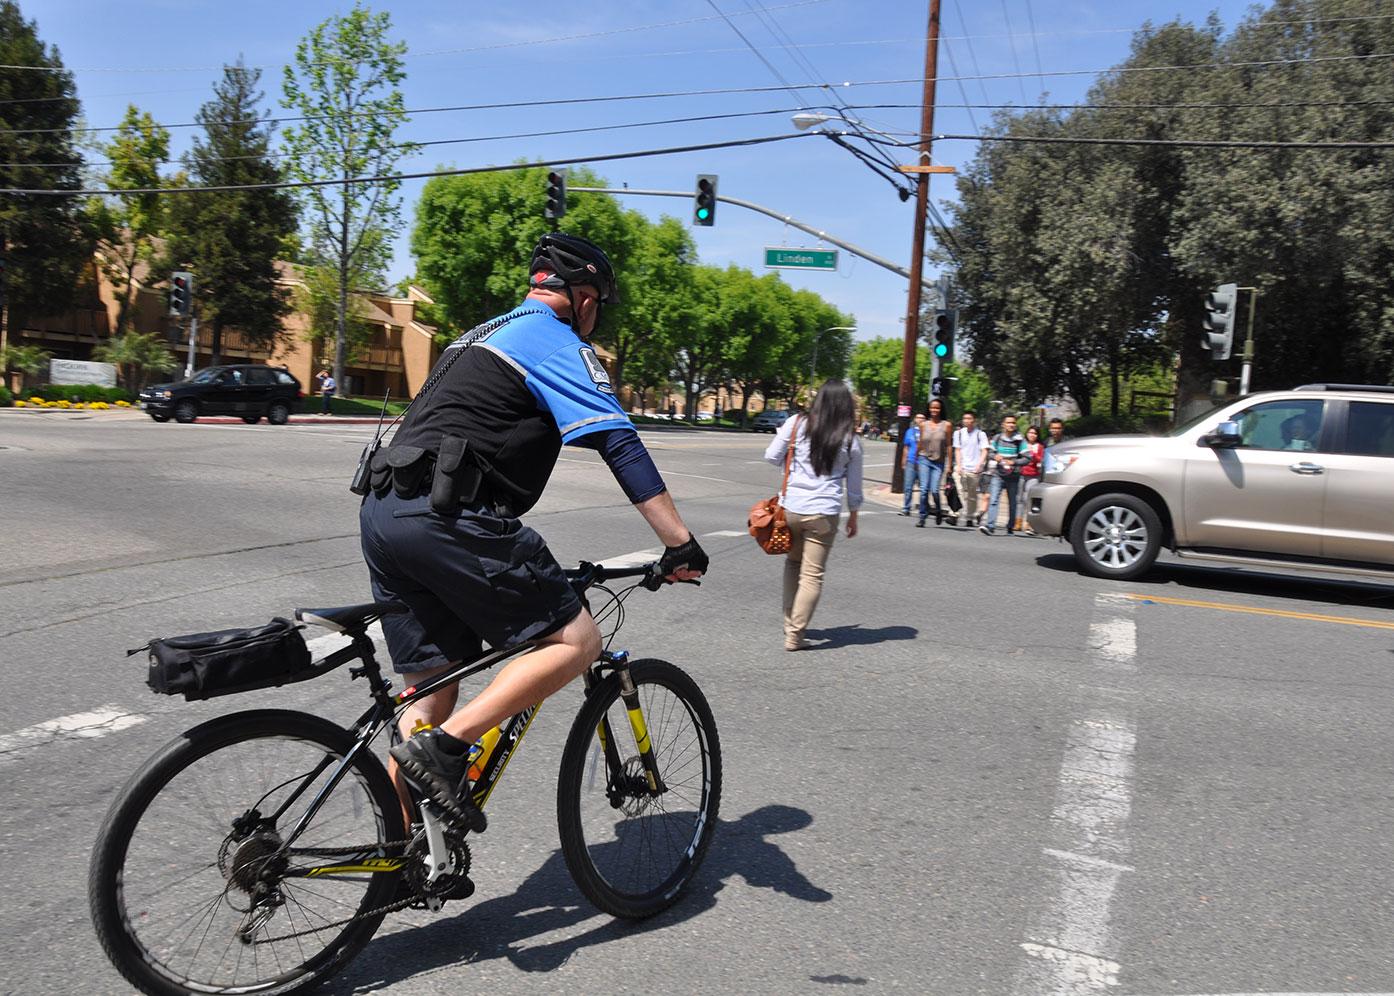 publics_campus_security_bike_1500w.jpg